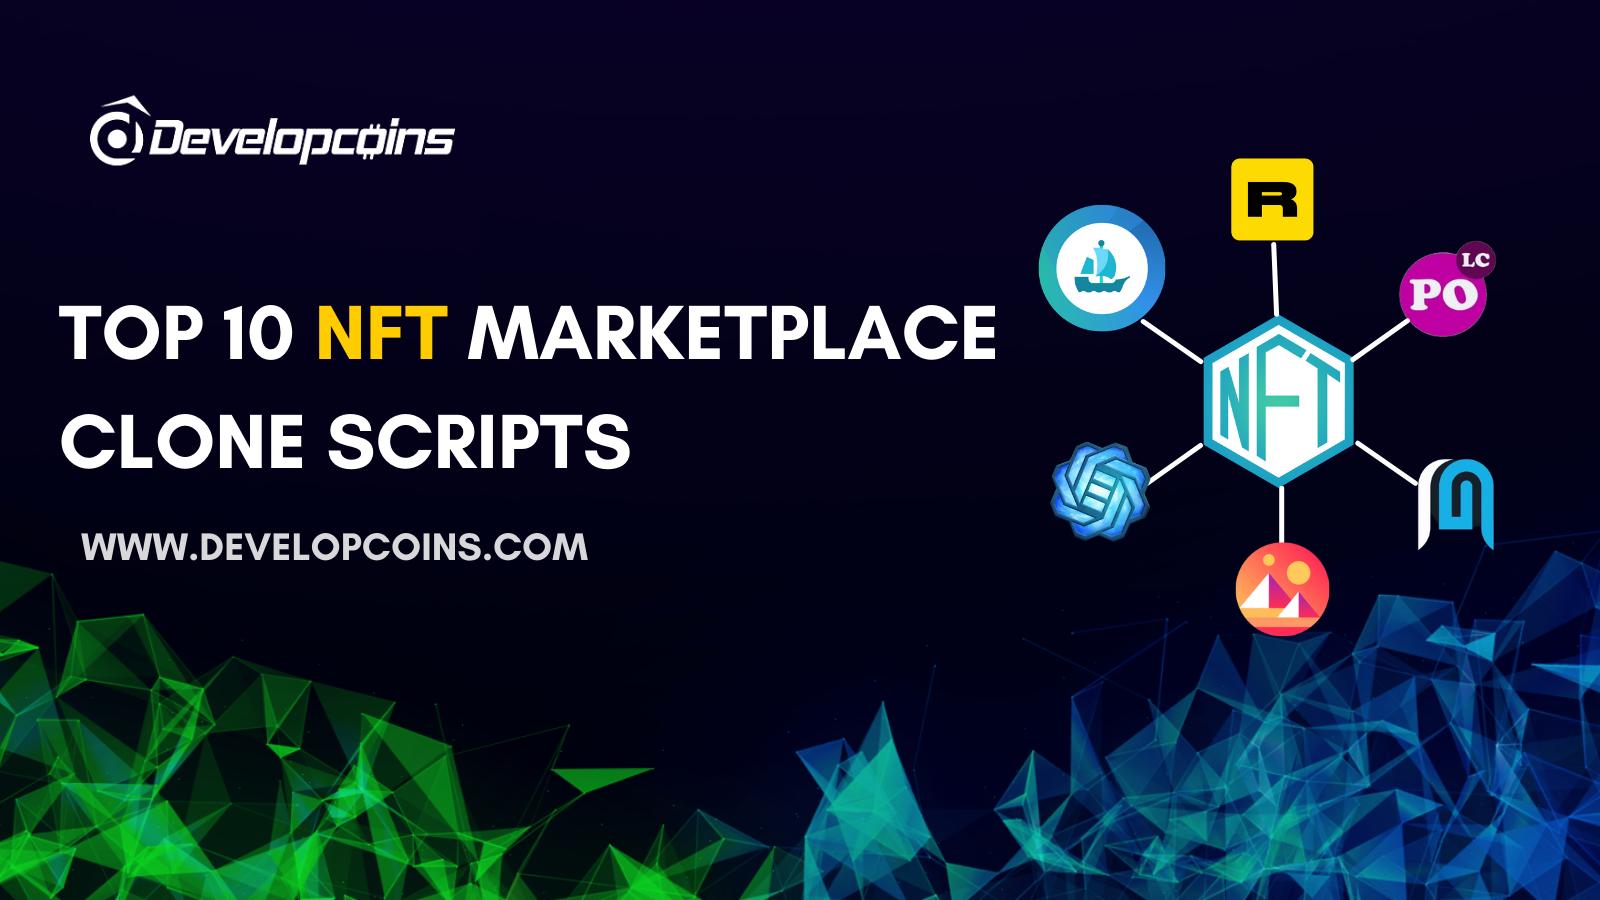 Top 10 NFT Marketplace Clone Scripts | Developcoins